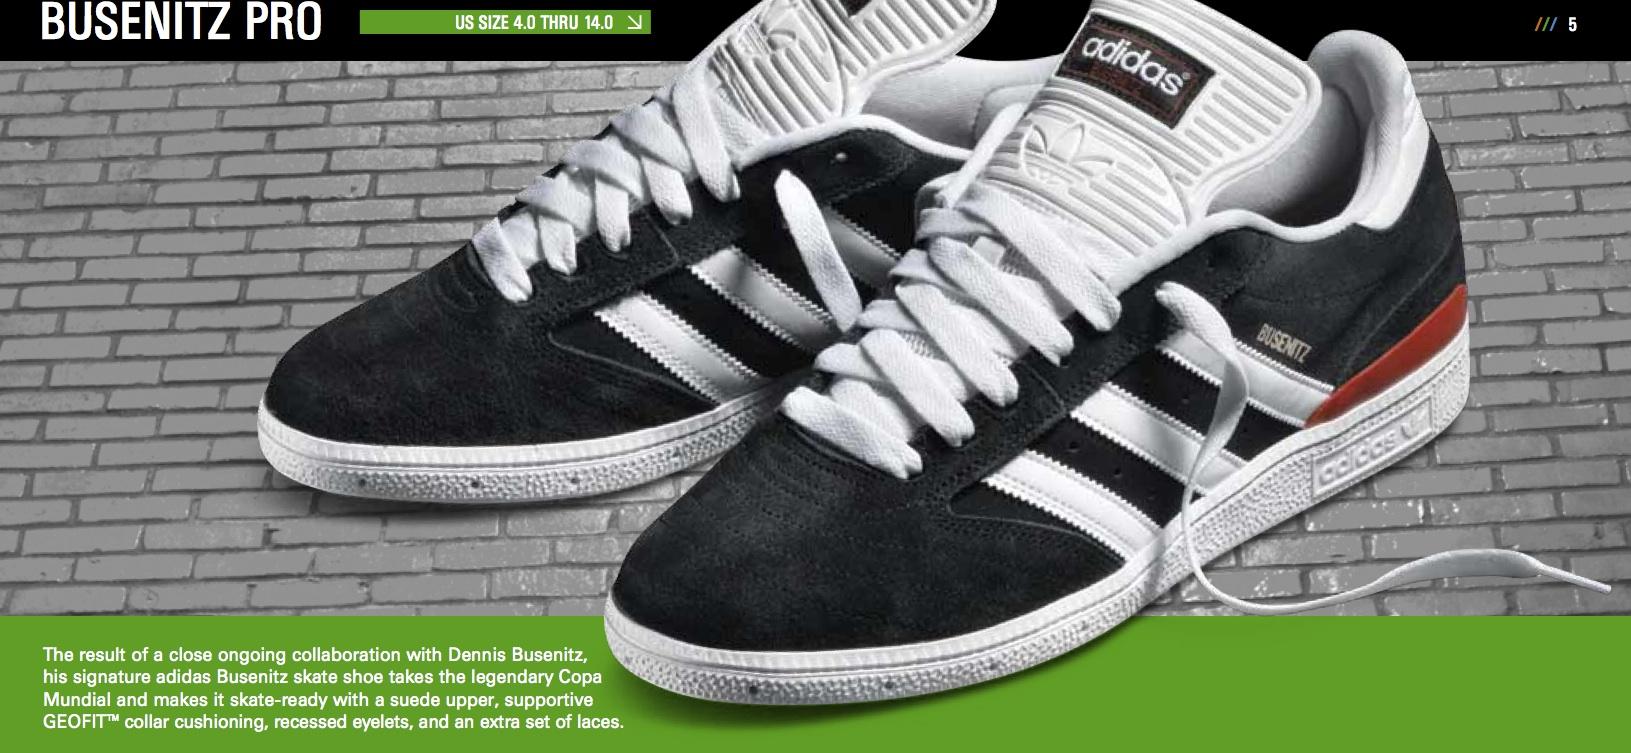 adidas busenitz pro advertisements PMWCDLR